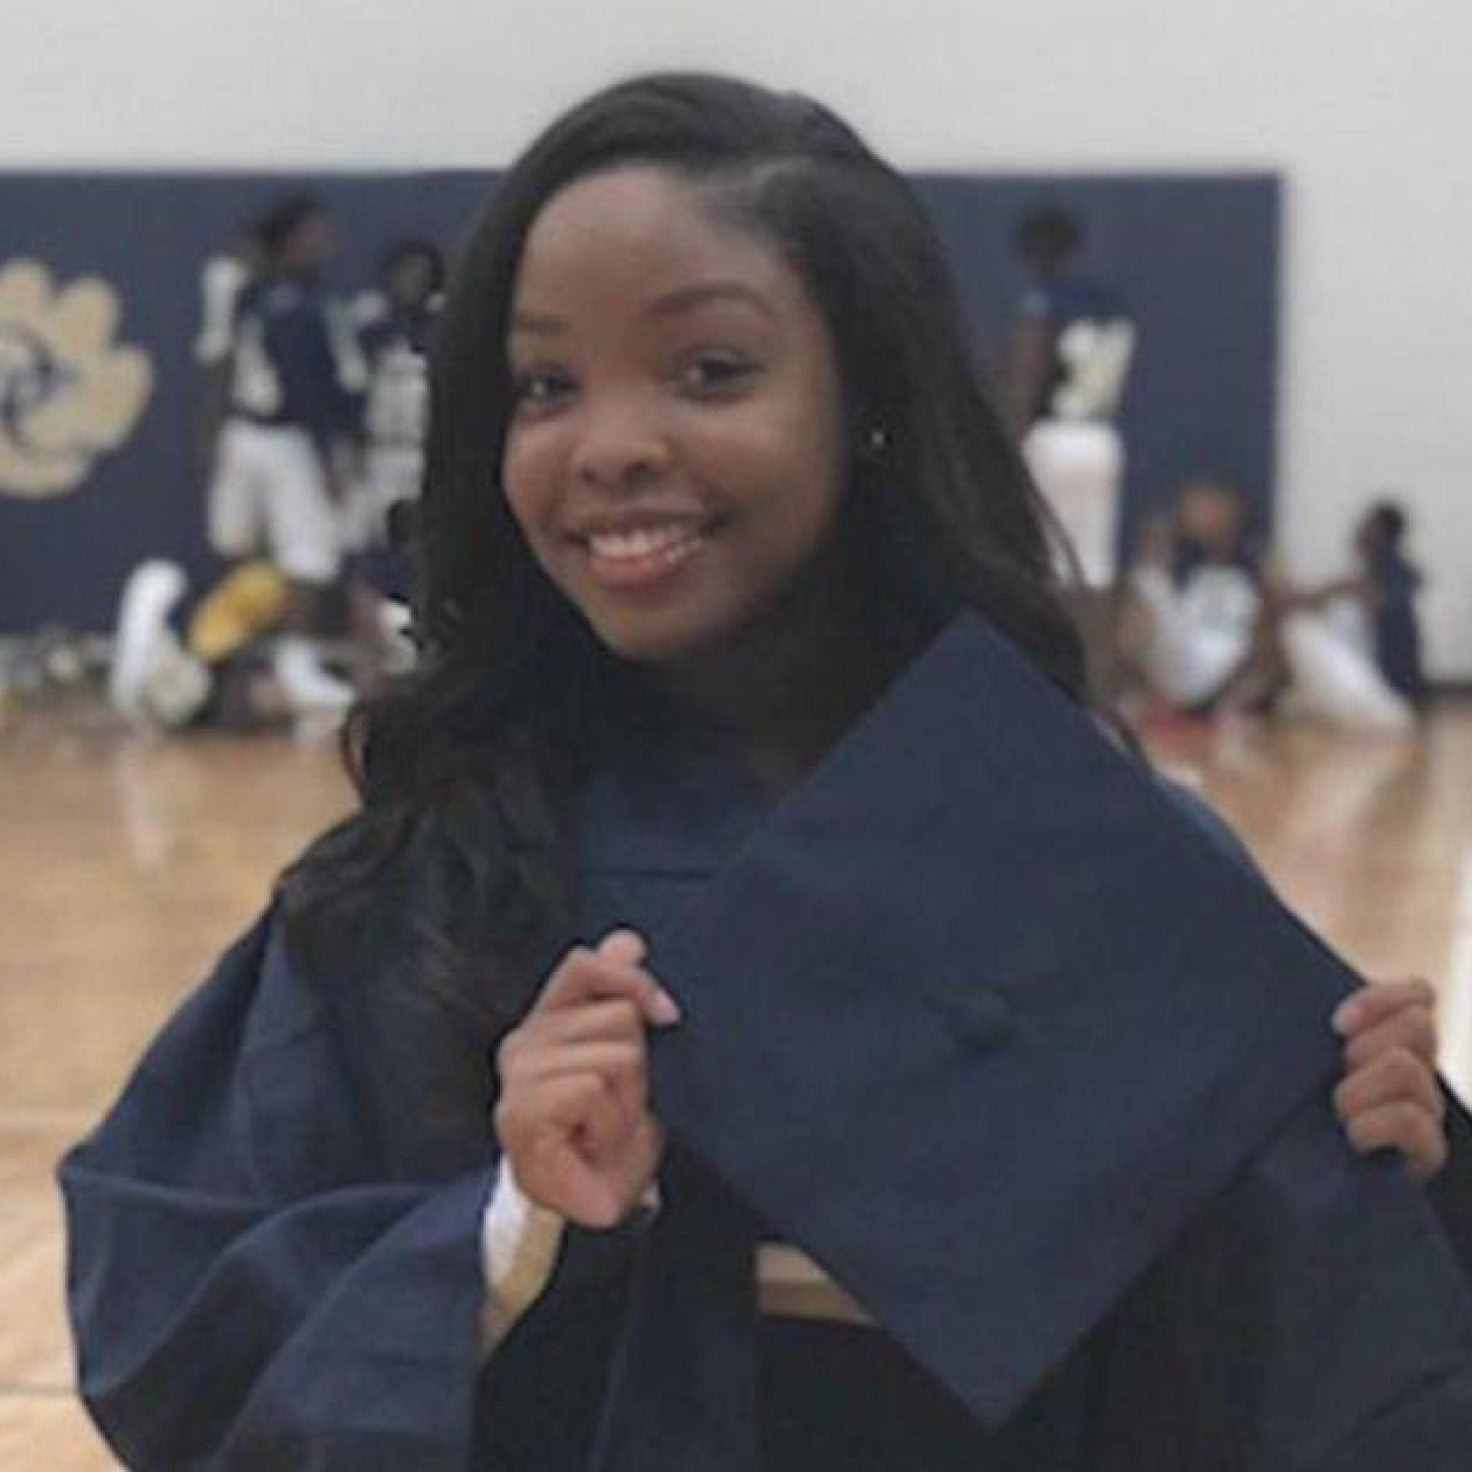 Atlanta Teen Accepted Into 39 Universities, Gains $1.6 million in scholarships